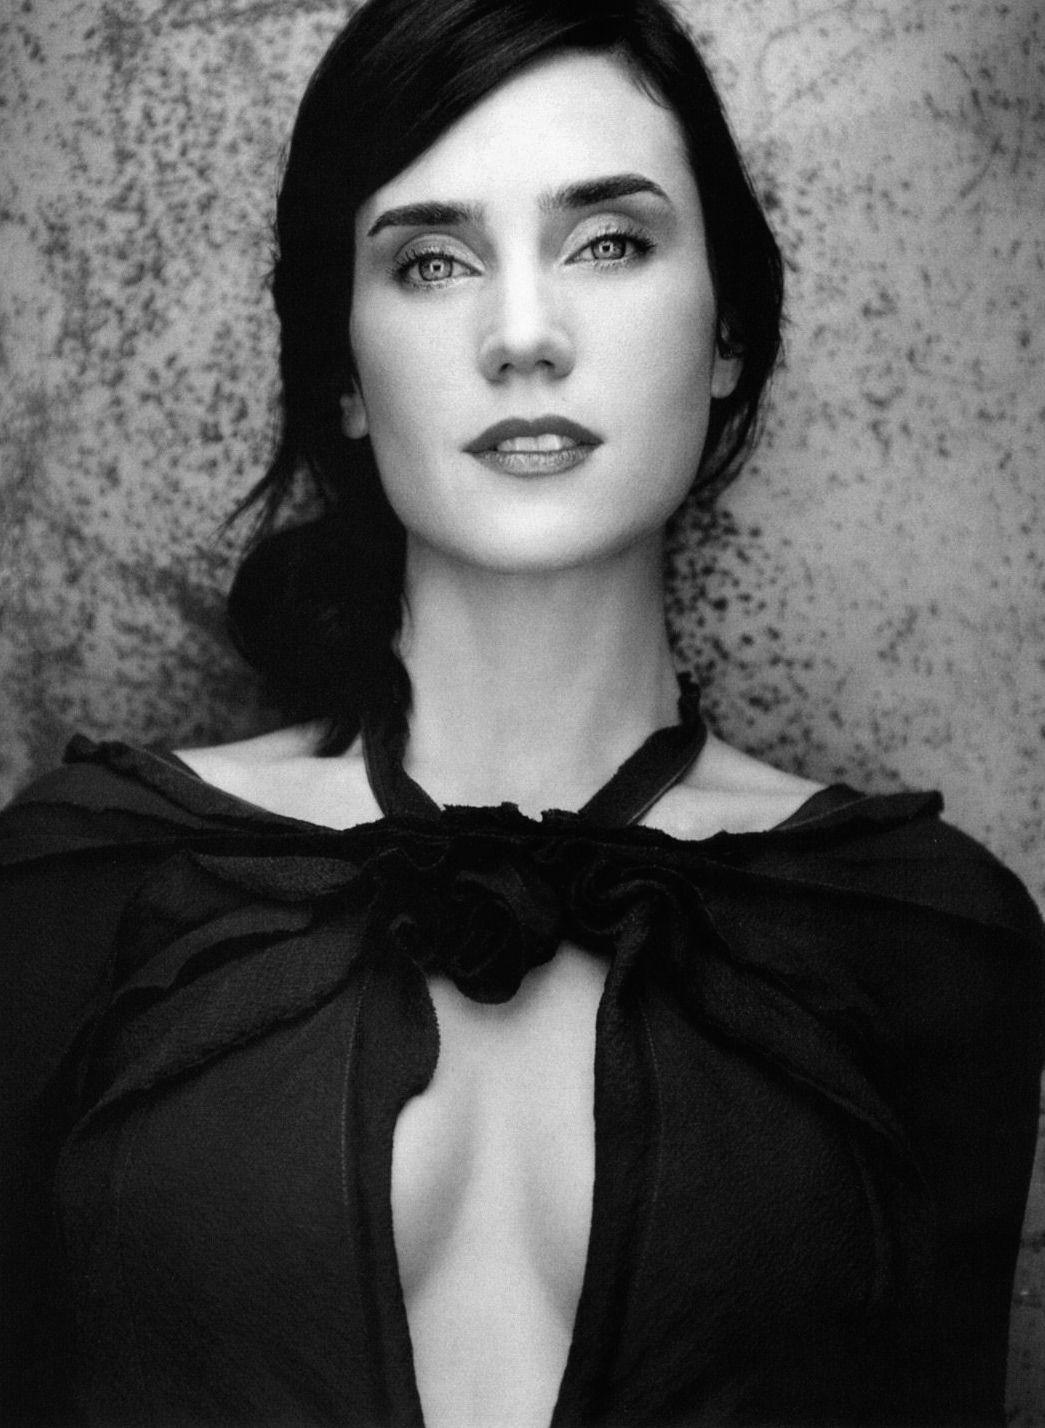 Cleavage Monica Foley nude photos 2019